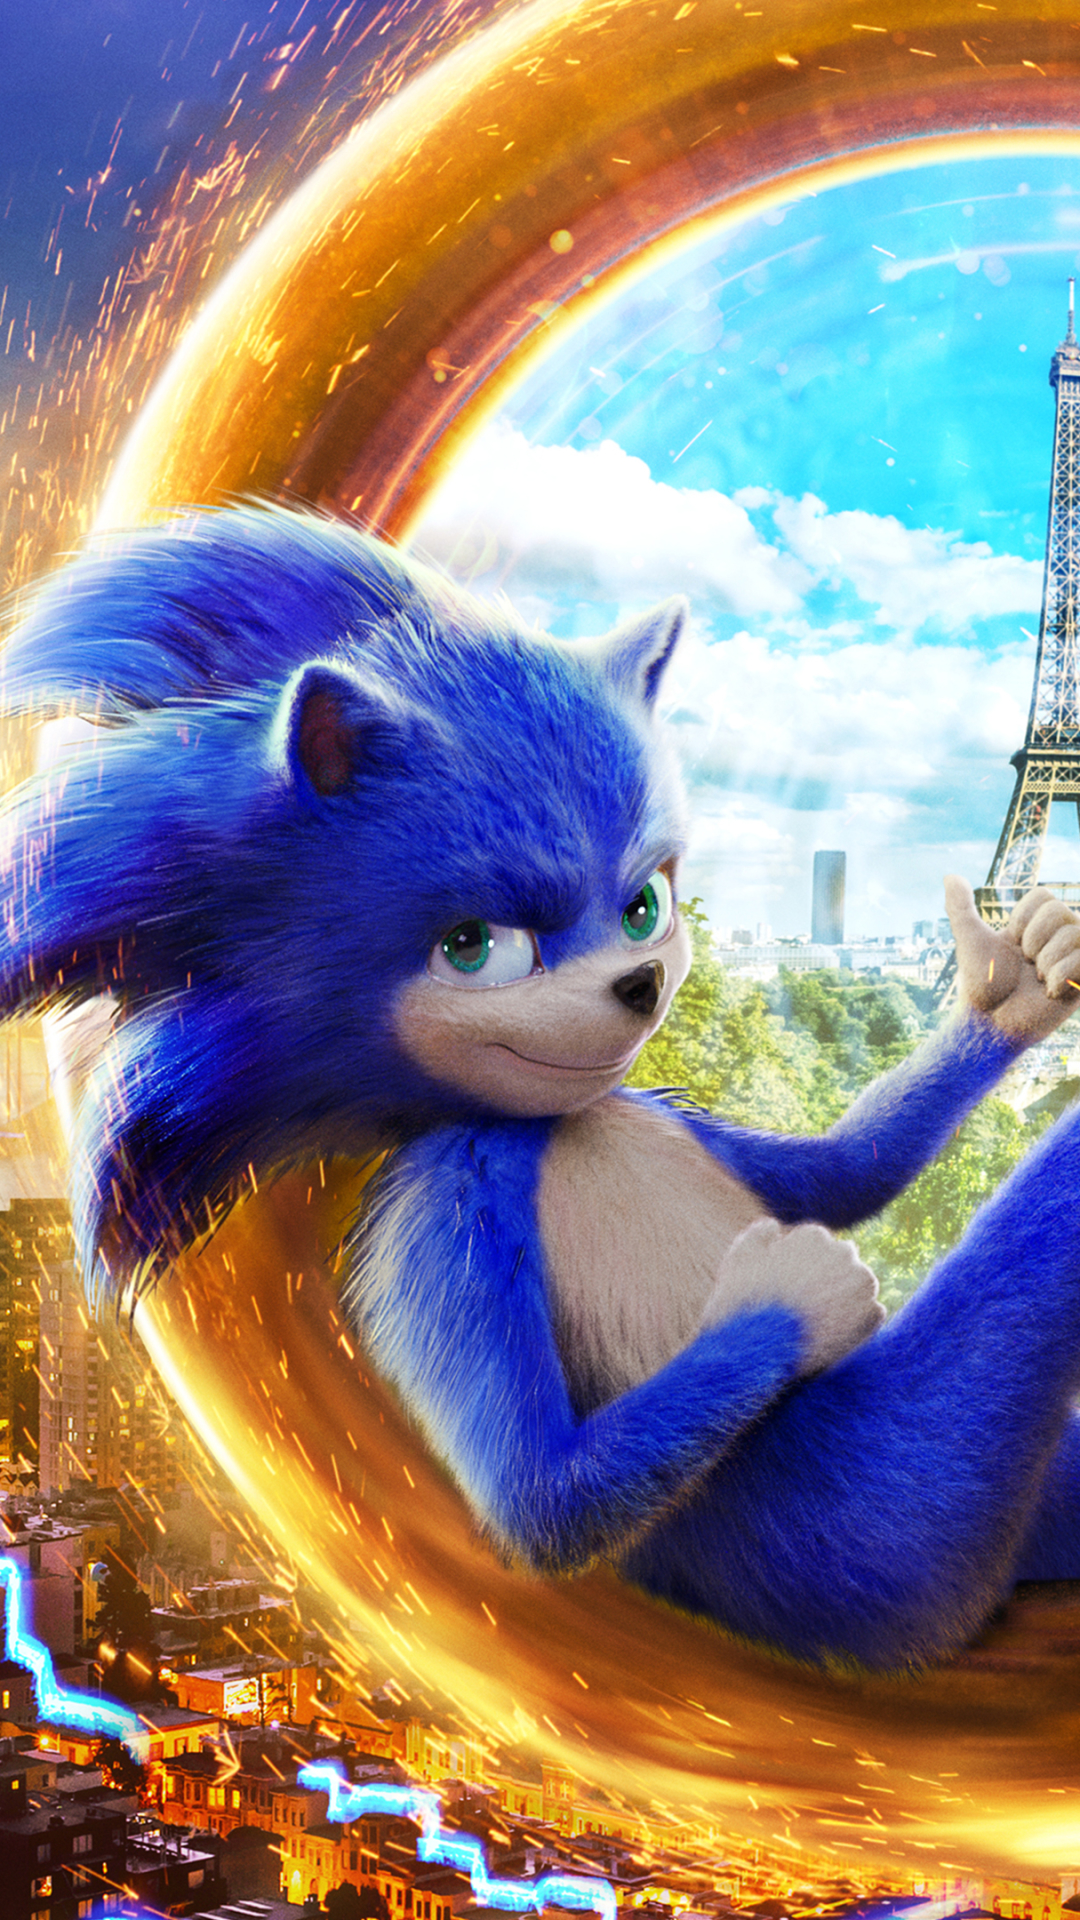 MovieSonic The Hedgehog 2020 1080x1920 Wallpaper ID 789678 1080x1920